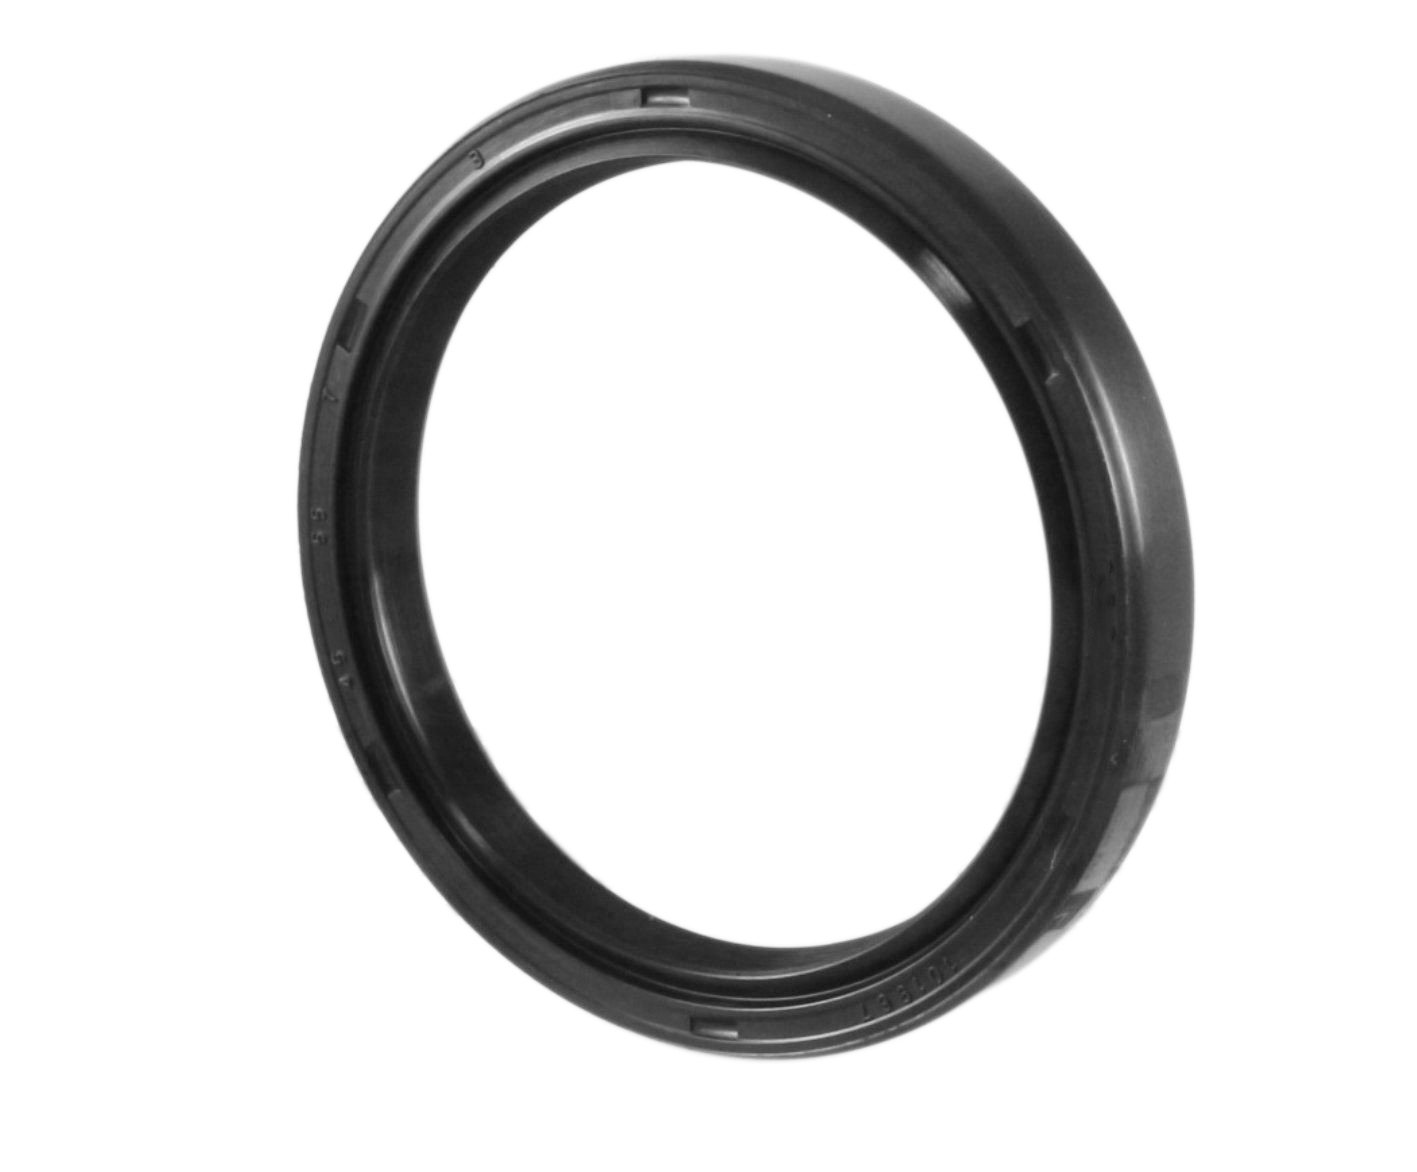 EAI Oil Seal 35mm X 55mm X 12mm TC Double Lip w//Spring 5 PCS Metal Case w//Nitrile Rubber Coating